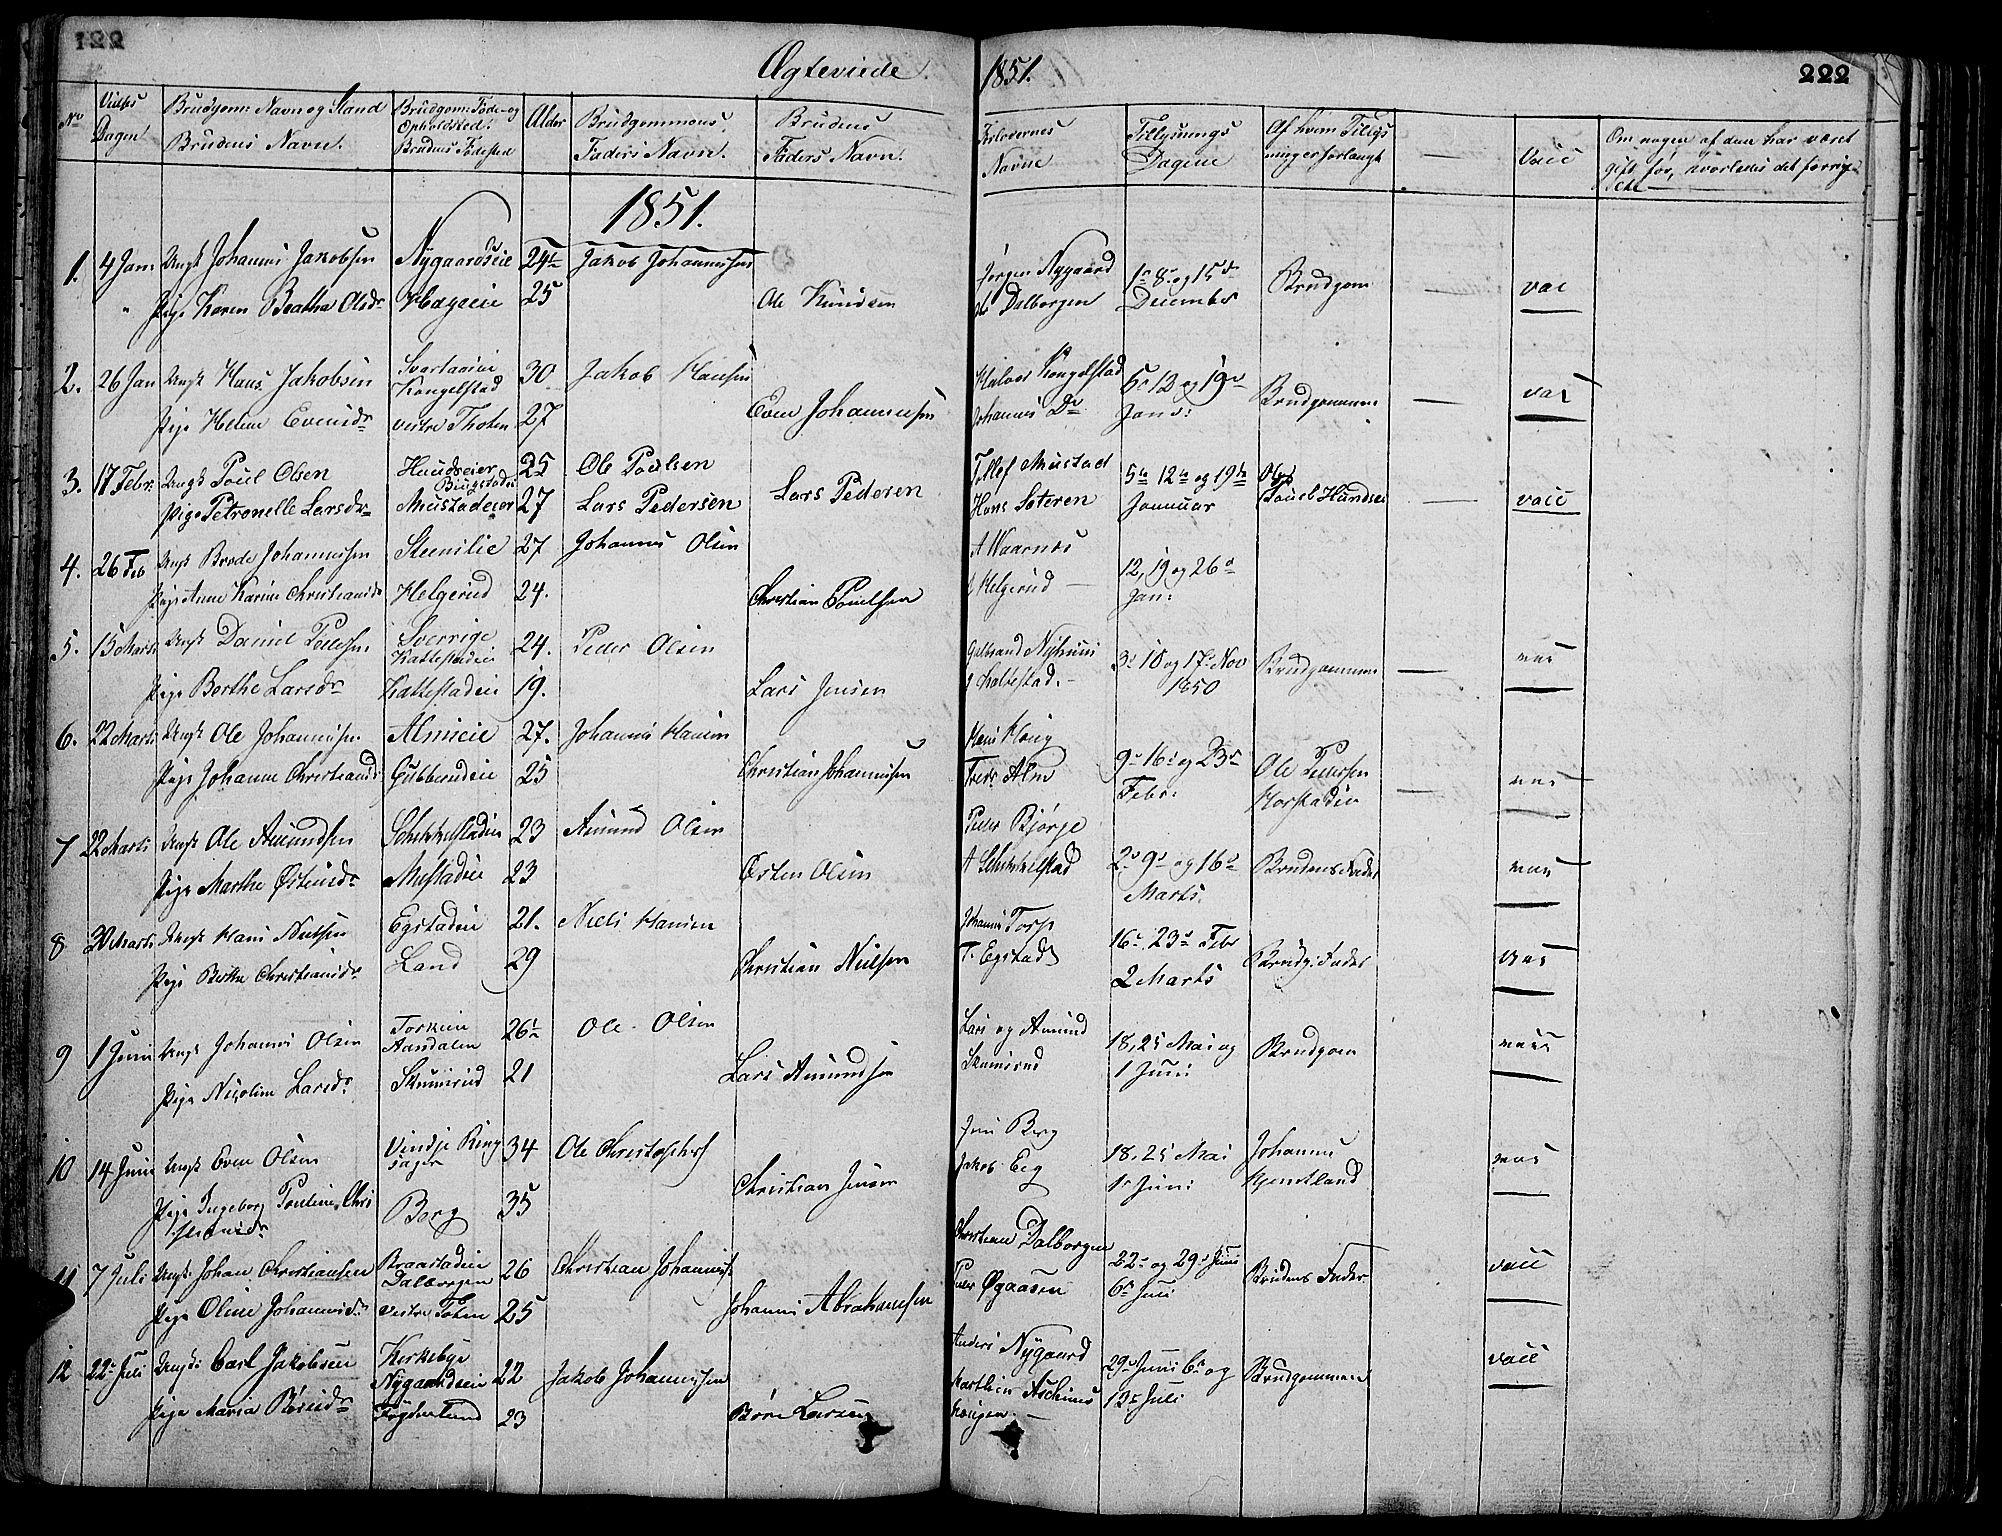 SAH, Vardal prestekontor, H/Ha/Hab/L0004: Klokkerbok nr. 4, 1831-1853, s. 222